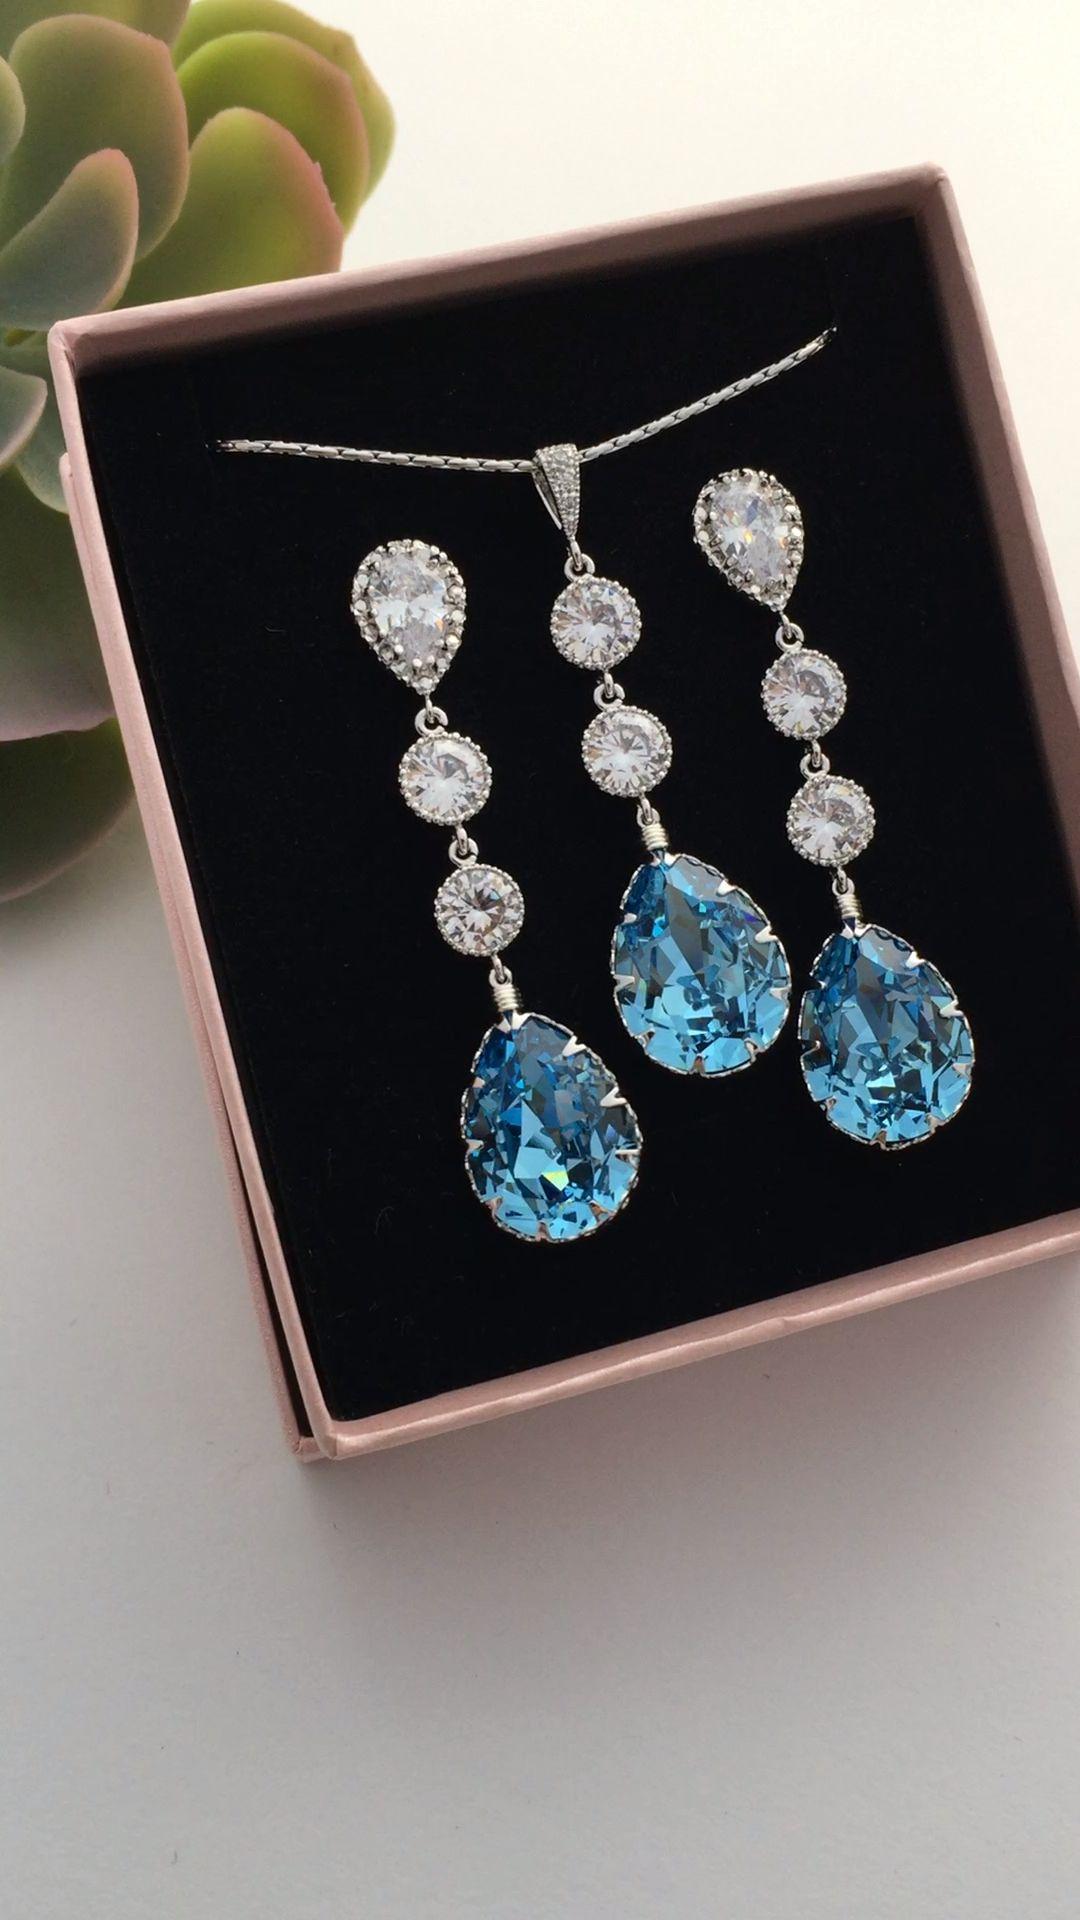 2e04a42cf Elegant luxurious Handmade Aquamarine Swarovski crystal bridal Jewelry set  from EarringsNation beach wedding aquamarine wedding garden wedding  something ...